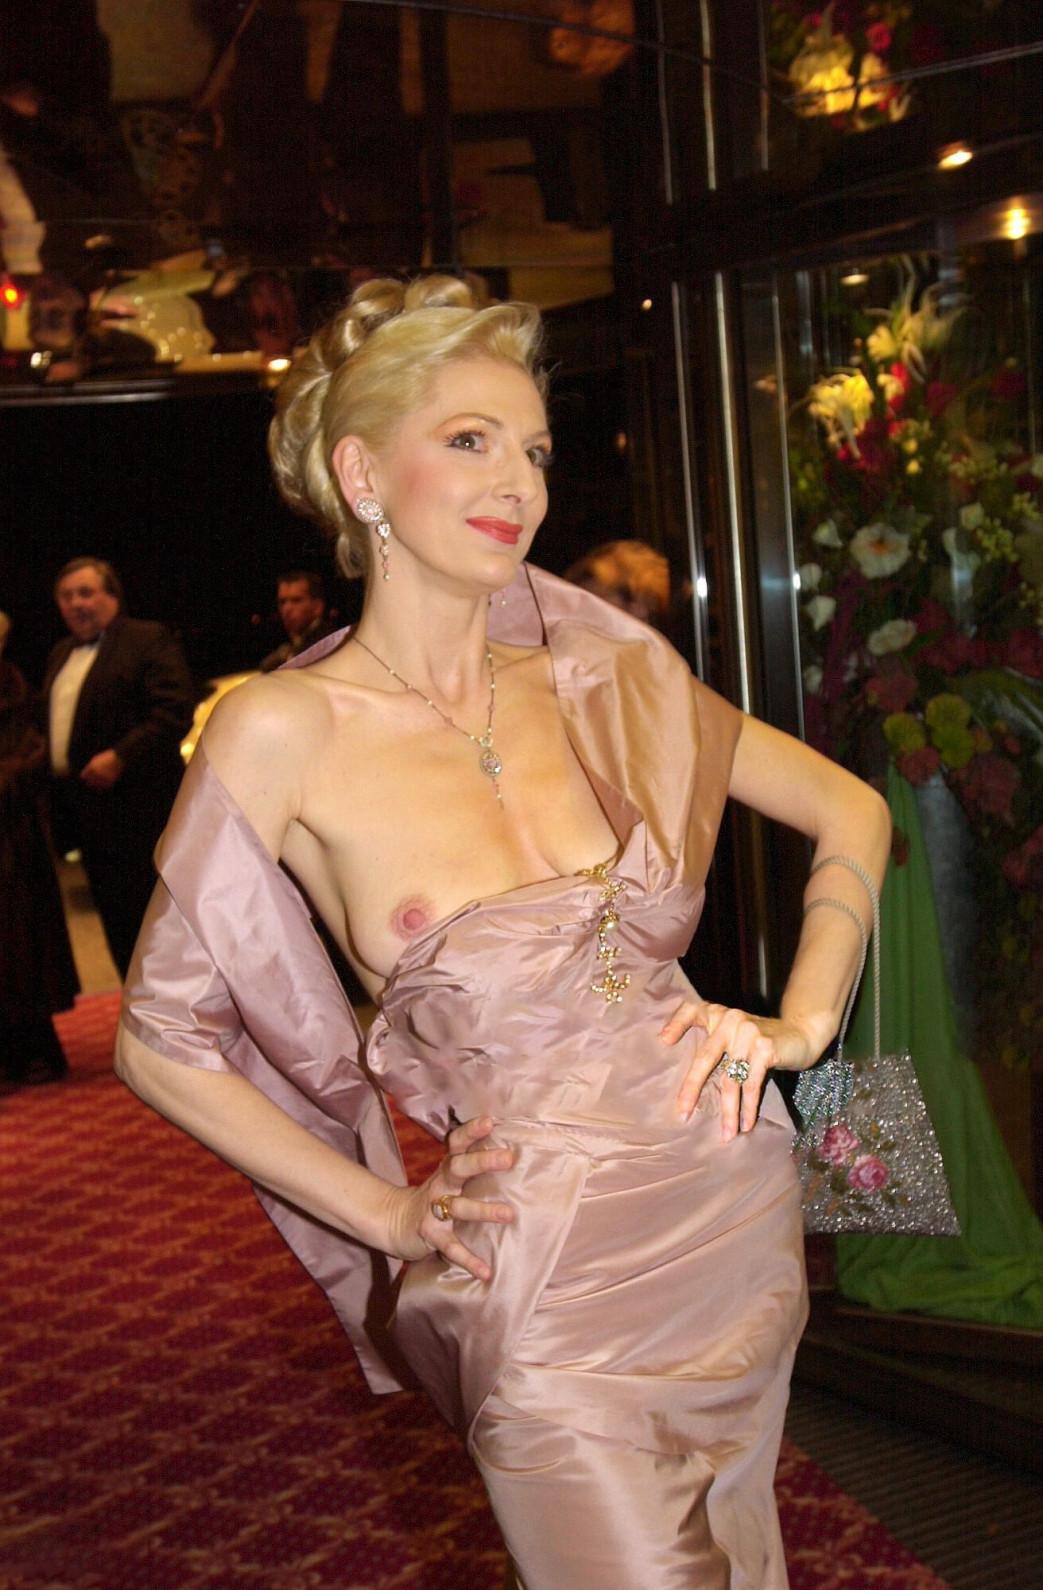 Desiree-Nick-Boob-Slip-at-unesco-benefiz-gala-2001-6.jpg